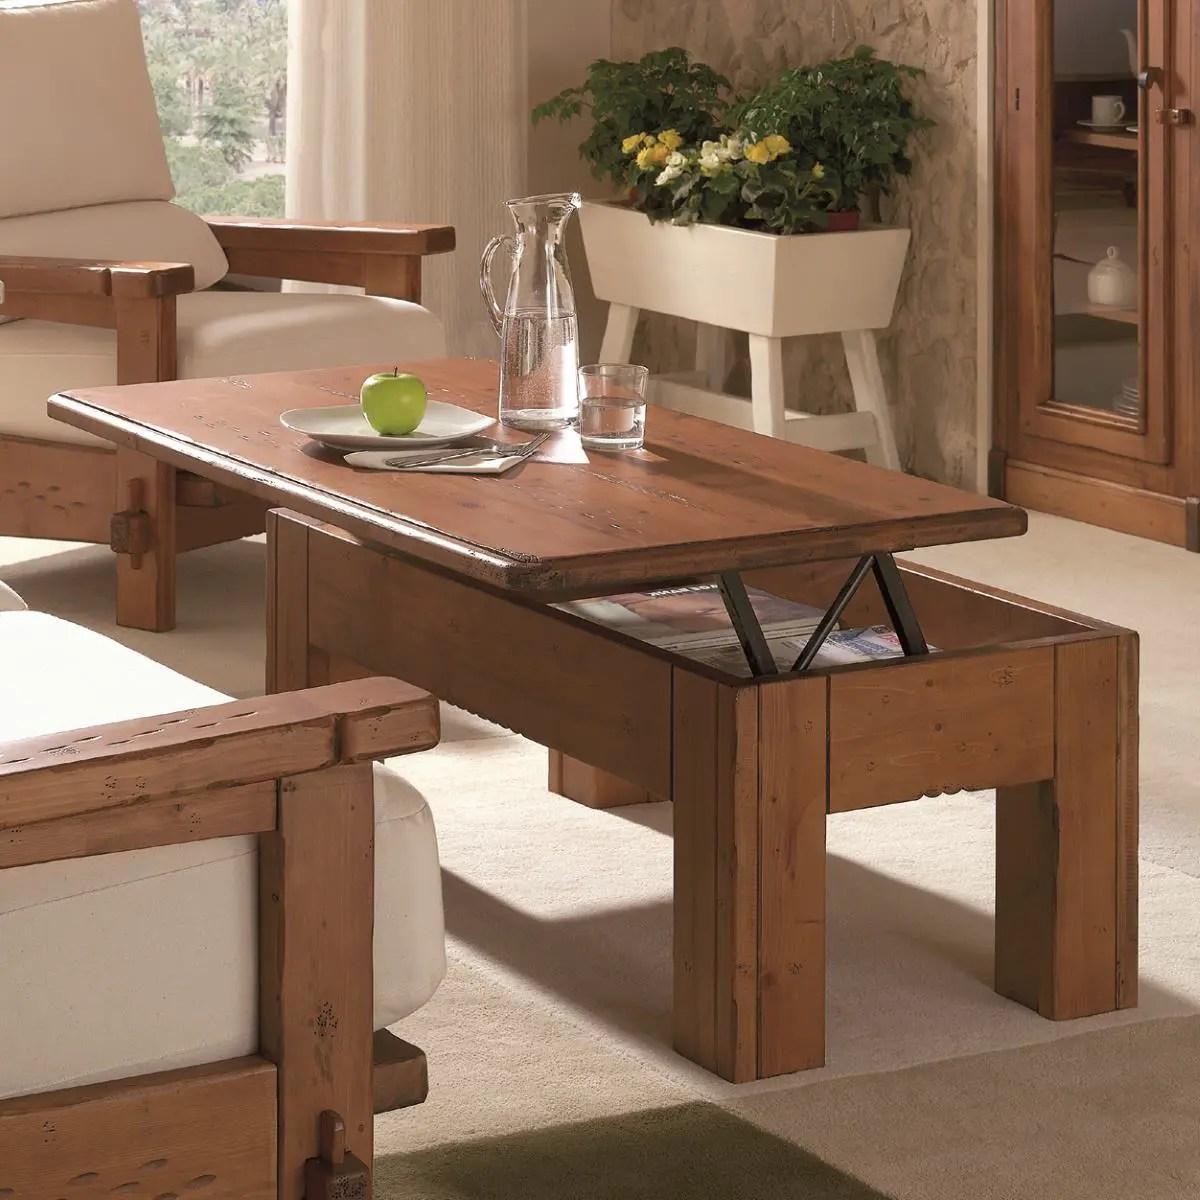 Mesa de centro rstica elevable Ecorstico venta de muebles